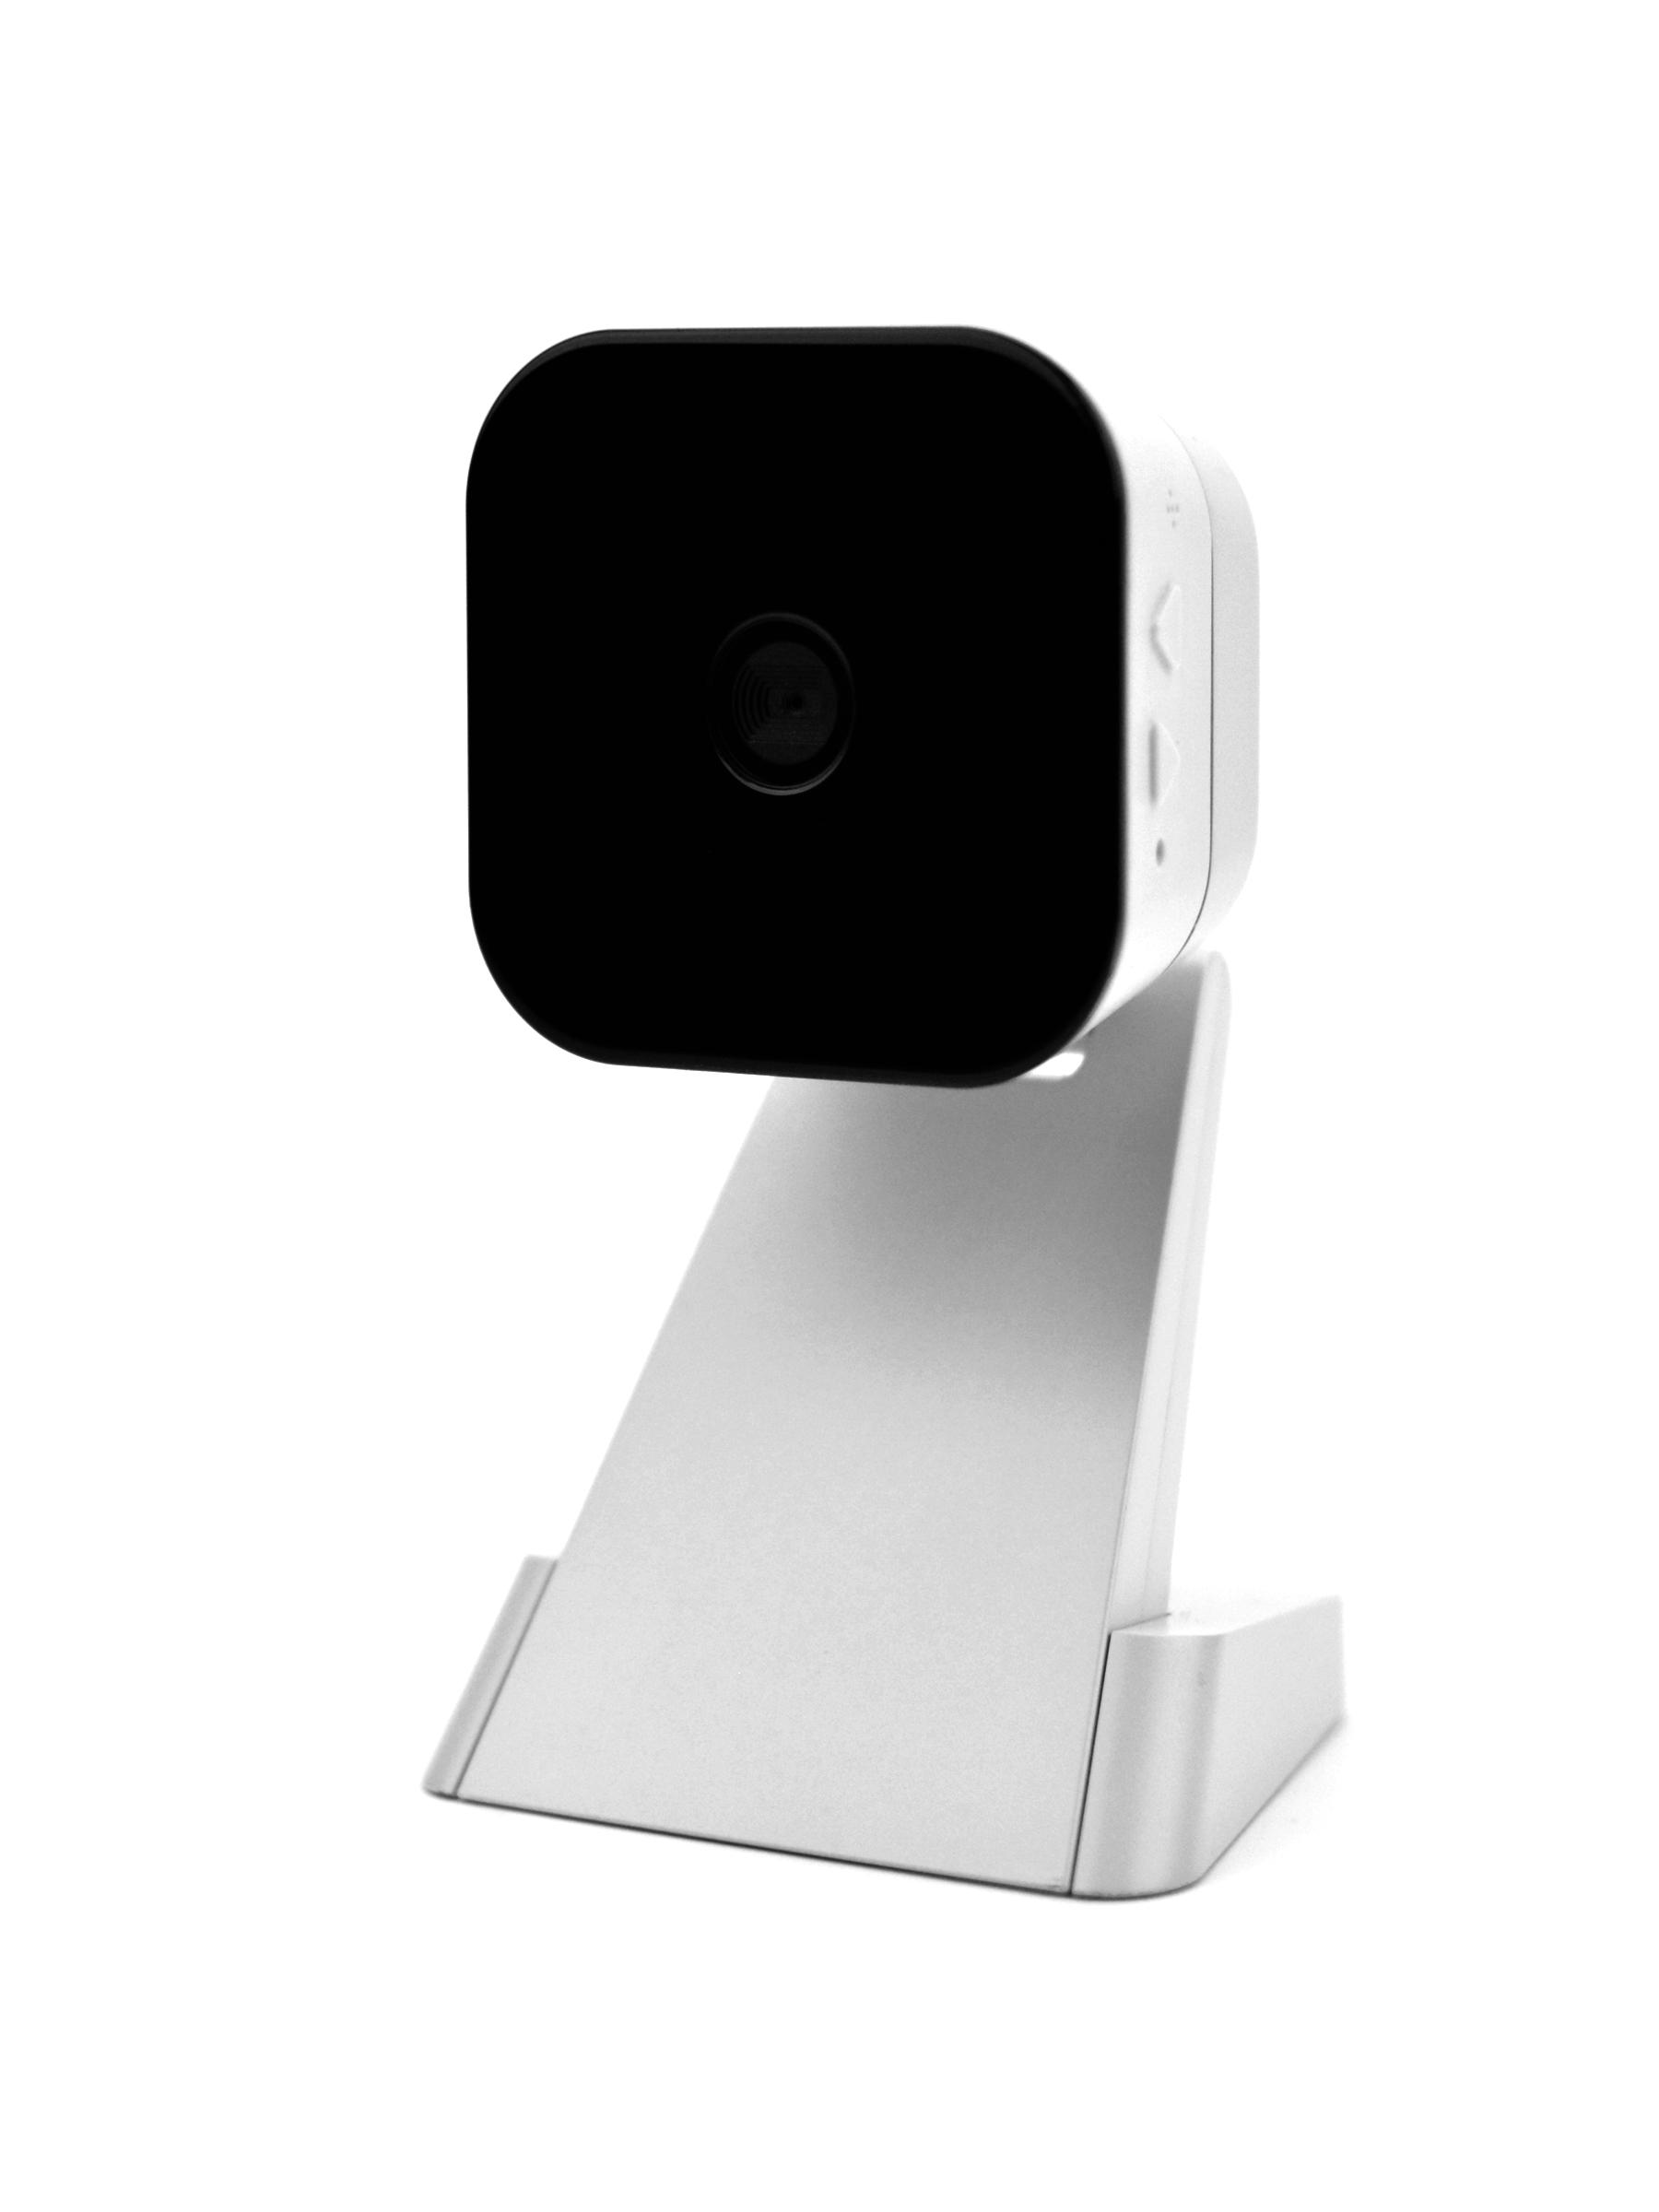 The Ocuity(TM) 500 Wireless IP Camera (HMNC500) (Photo: Business Wire)